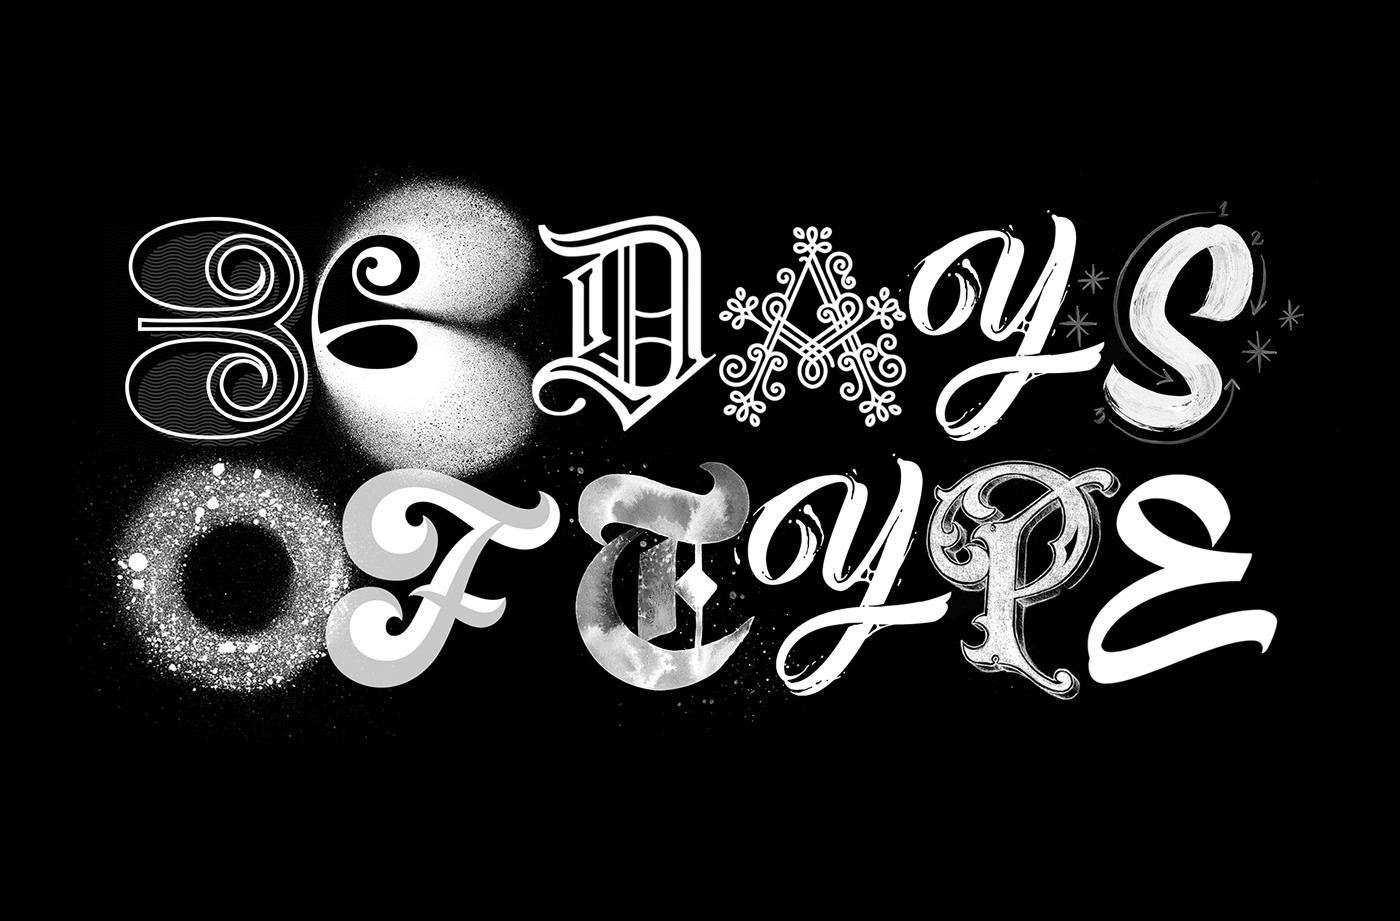 36daysoftype tipografia caligrafia lettering brush Blackletter gif blackandwhite